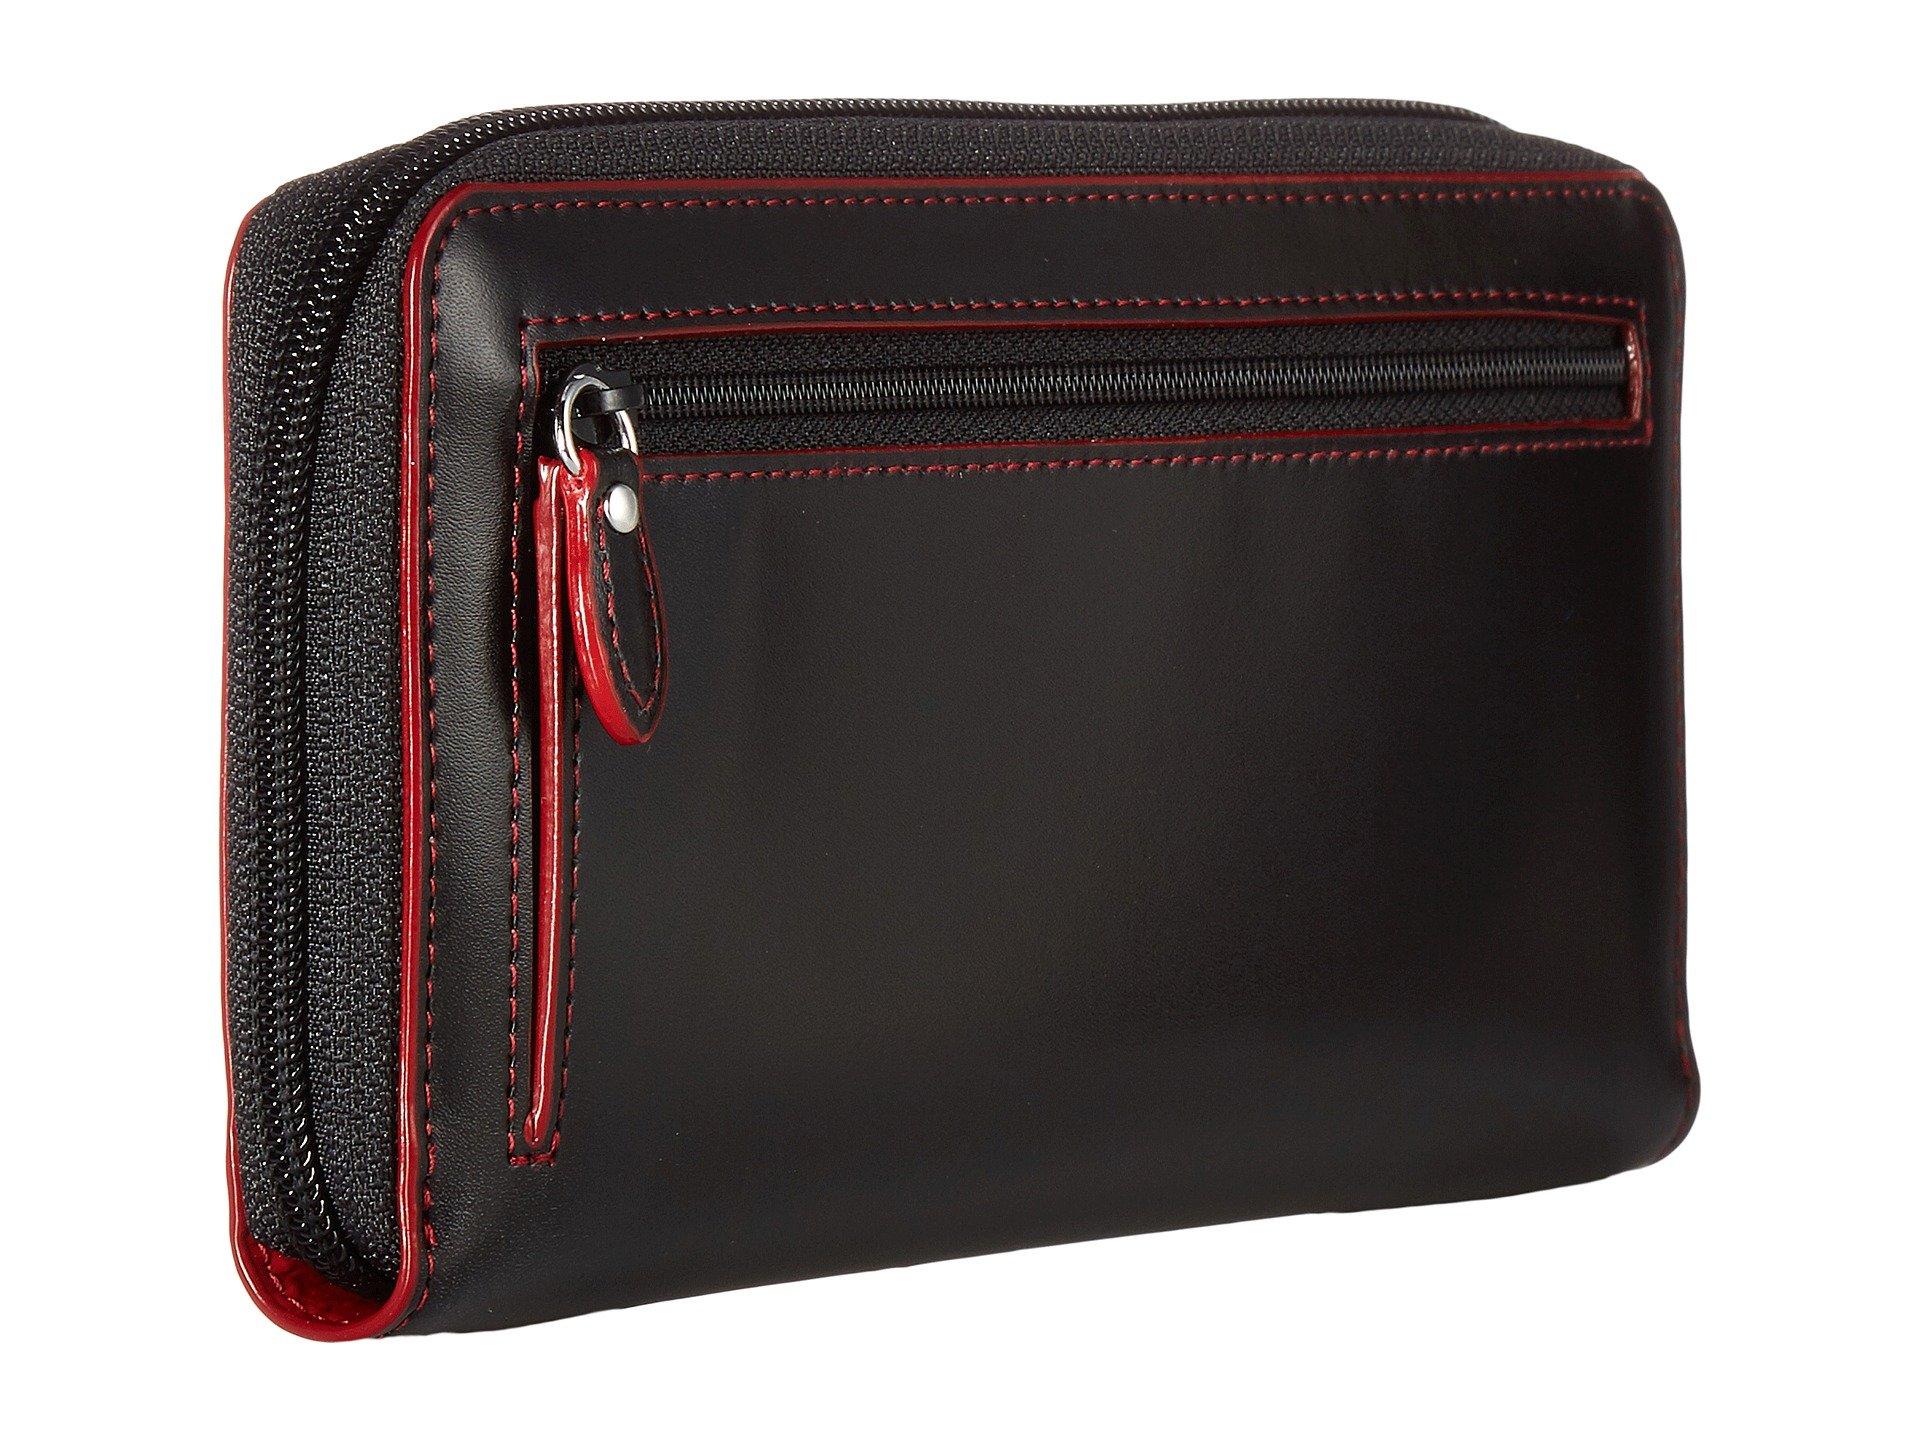 Perla Black Wallet amp; Under Accessories Lodis Key Rfid Lock Zip Audrey wpqFSPg